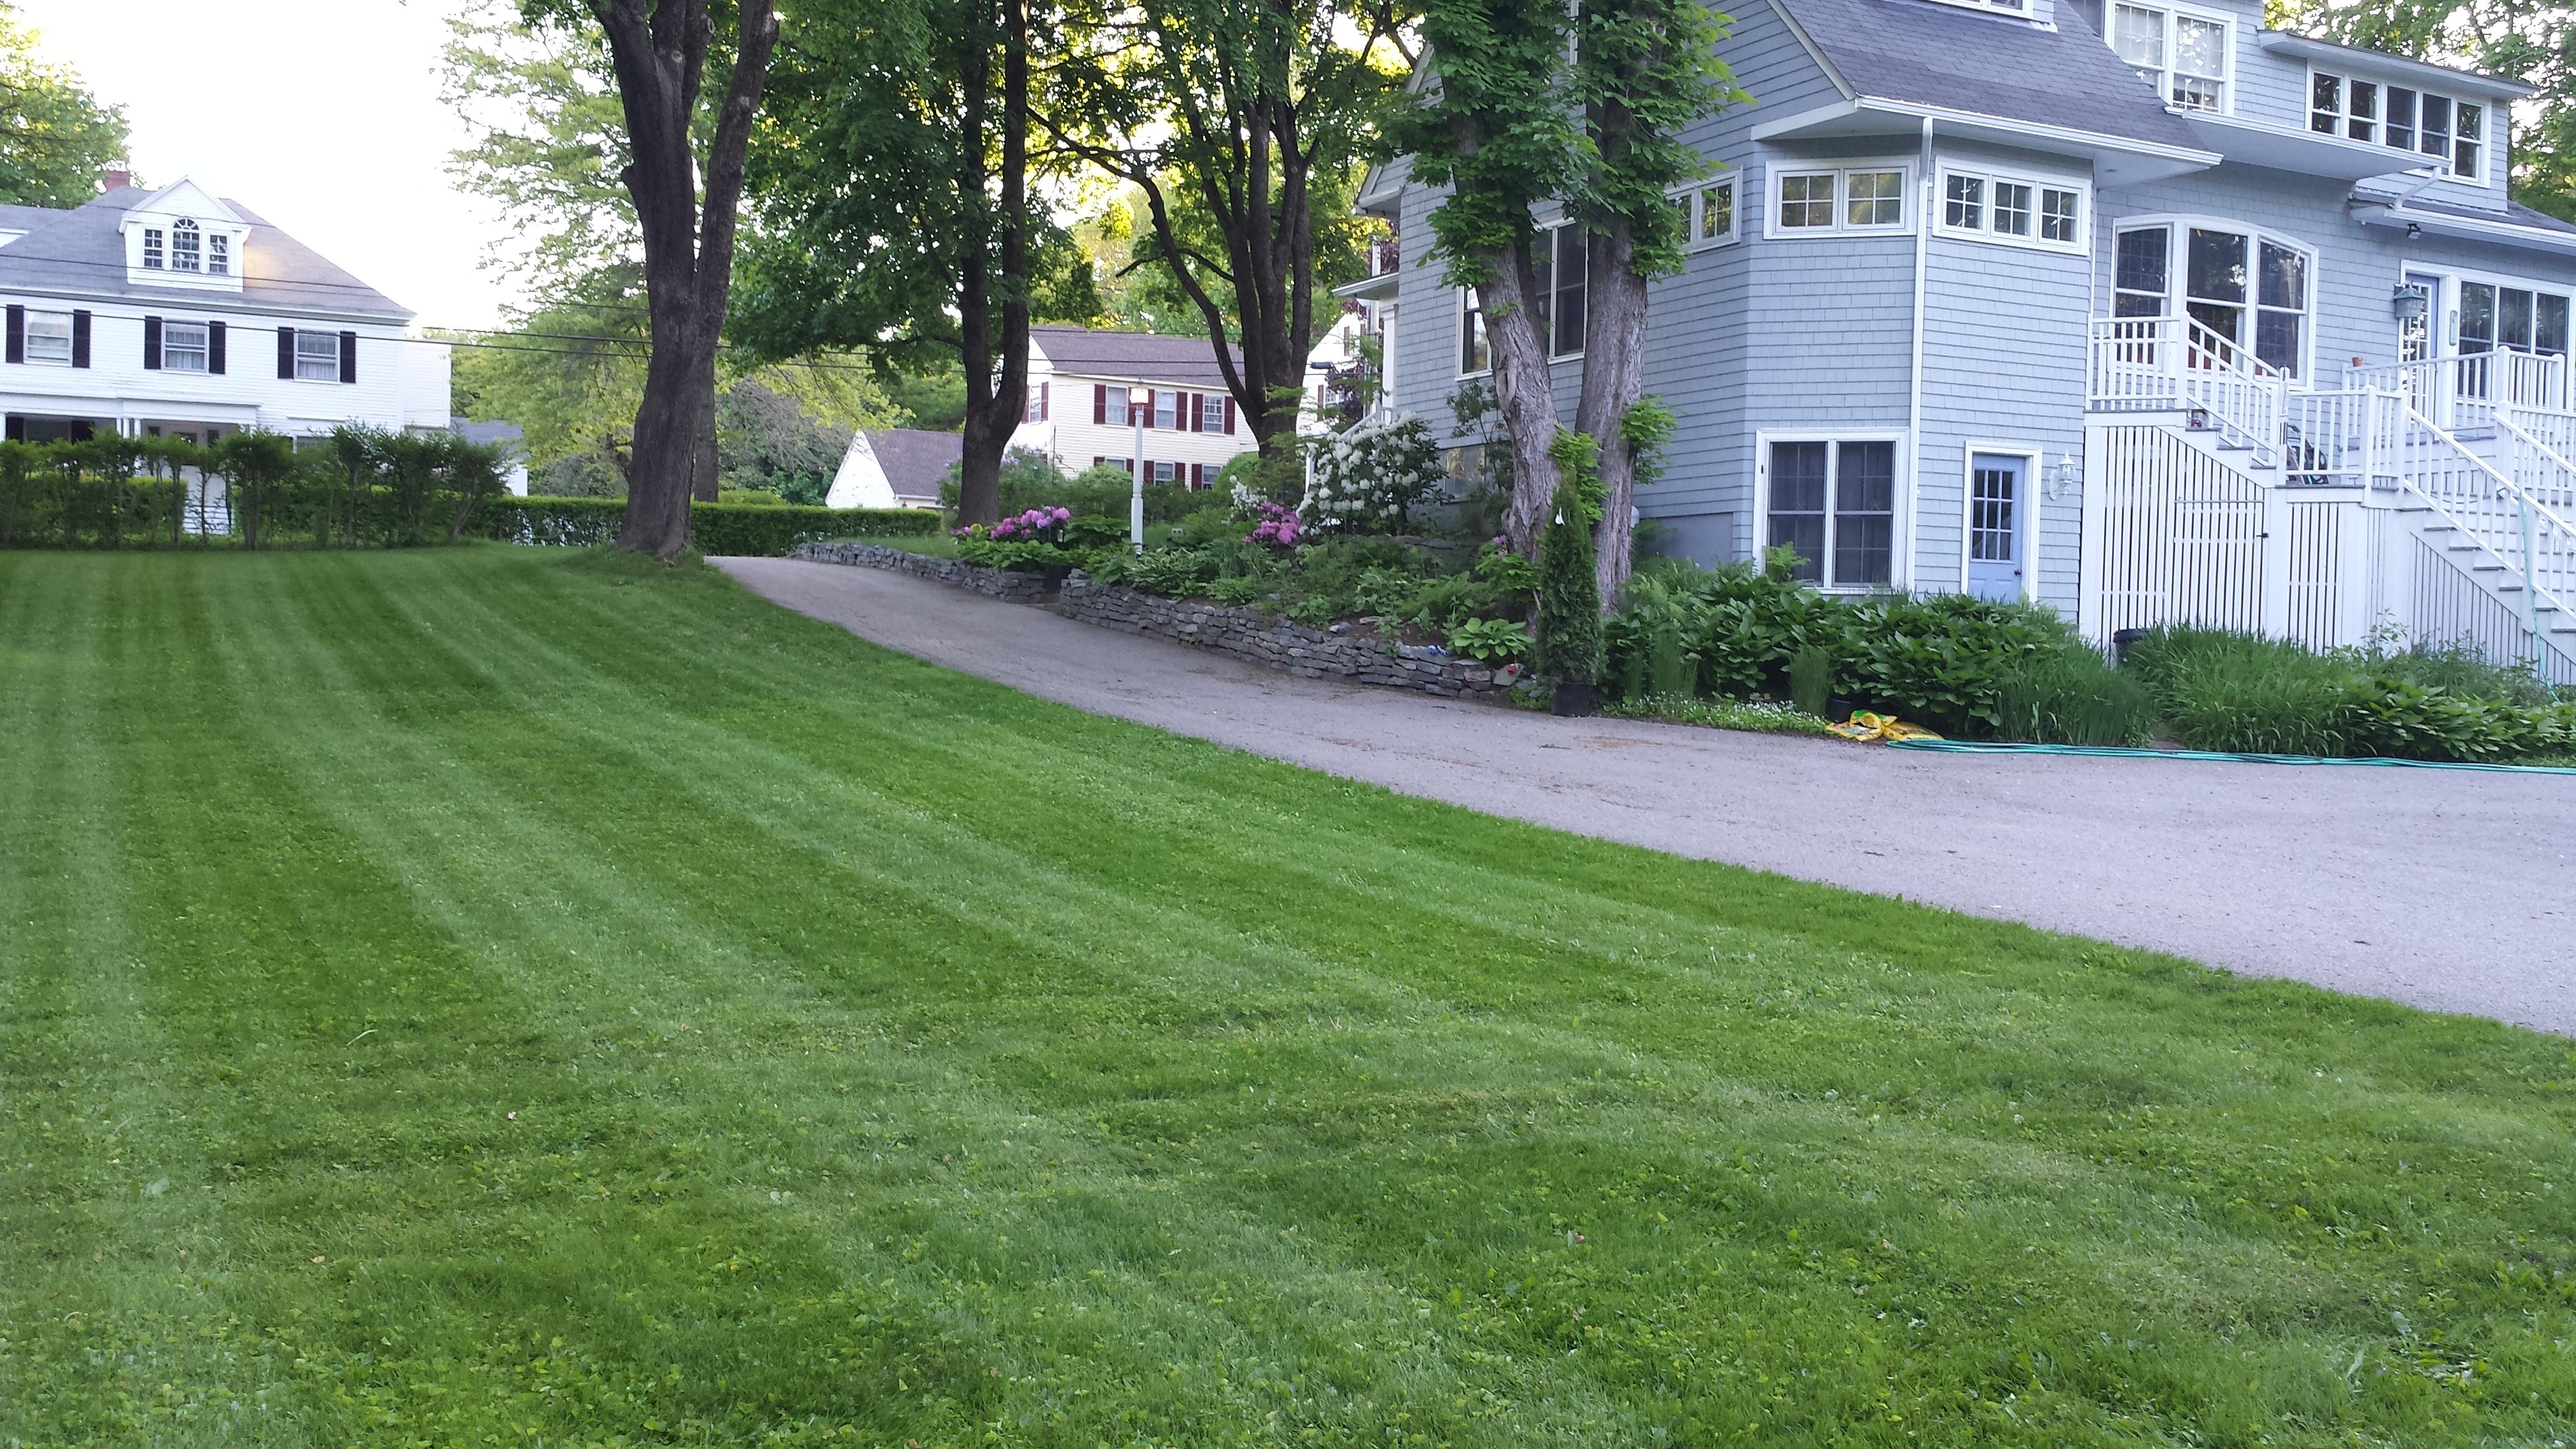 Judy's Lawn